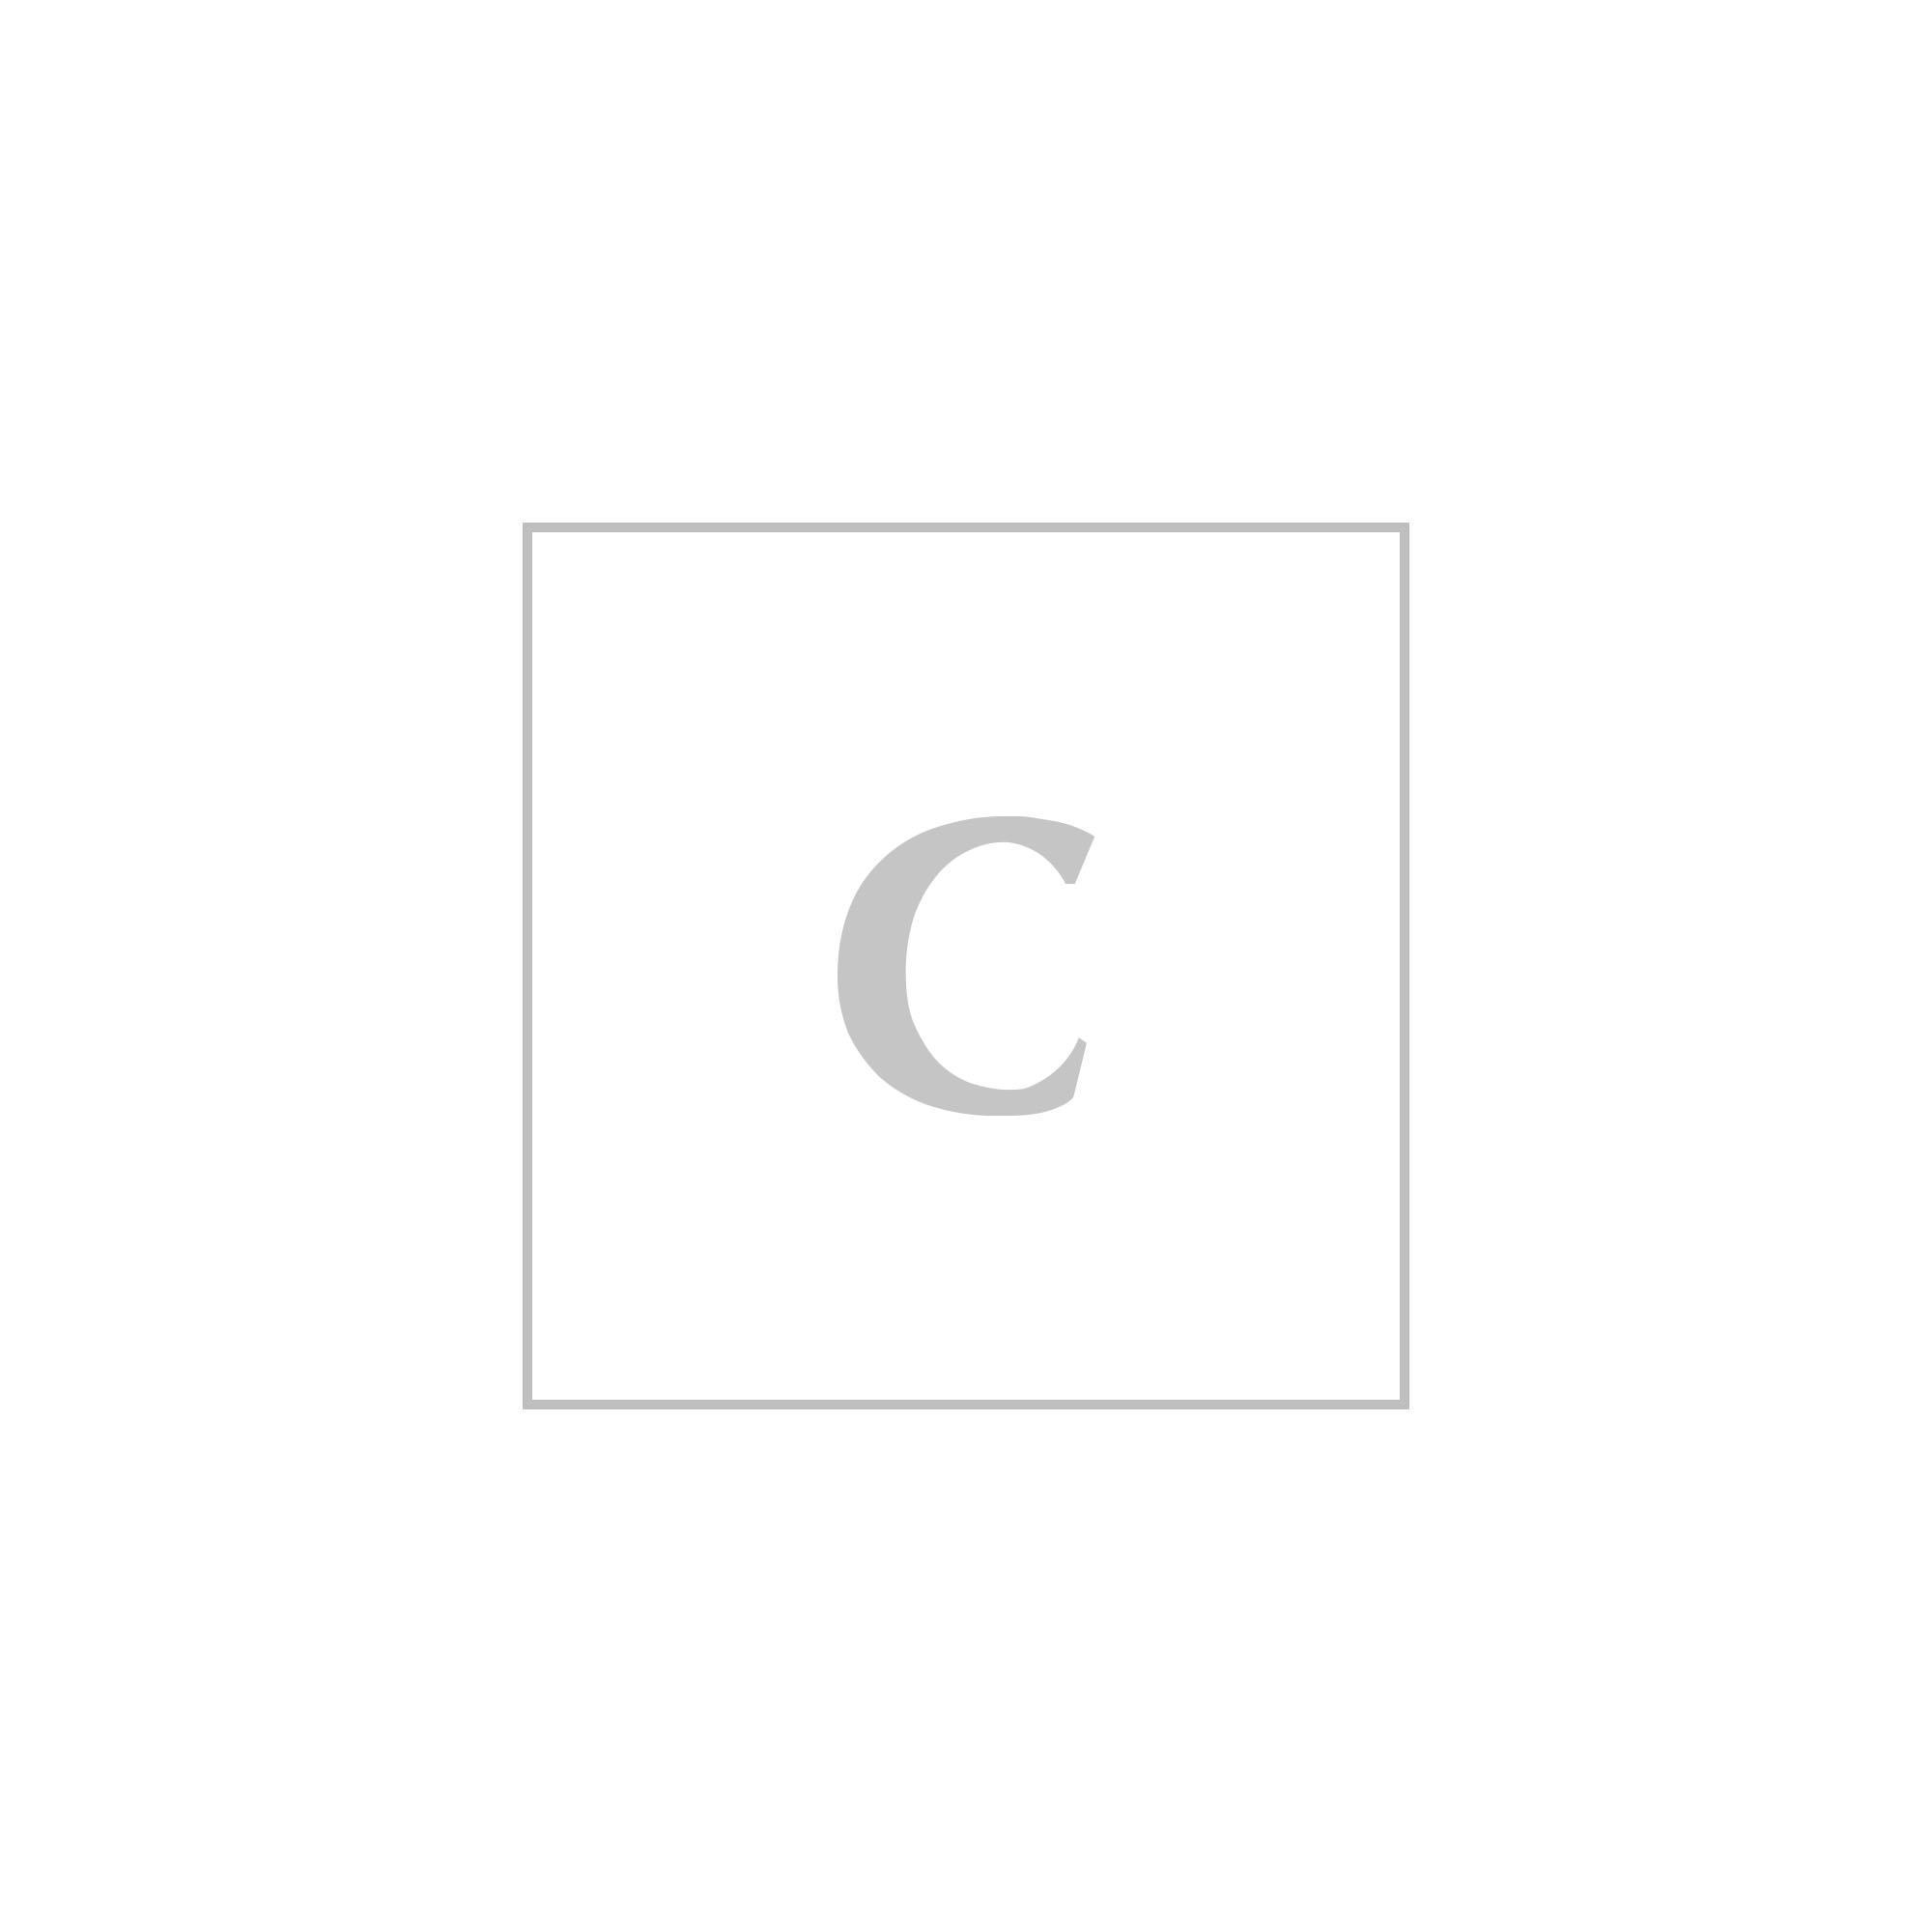 Dolce & gabbana borsa a mano pelle stampa iguana sicily